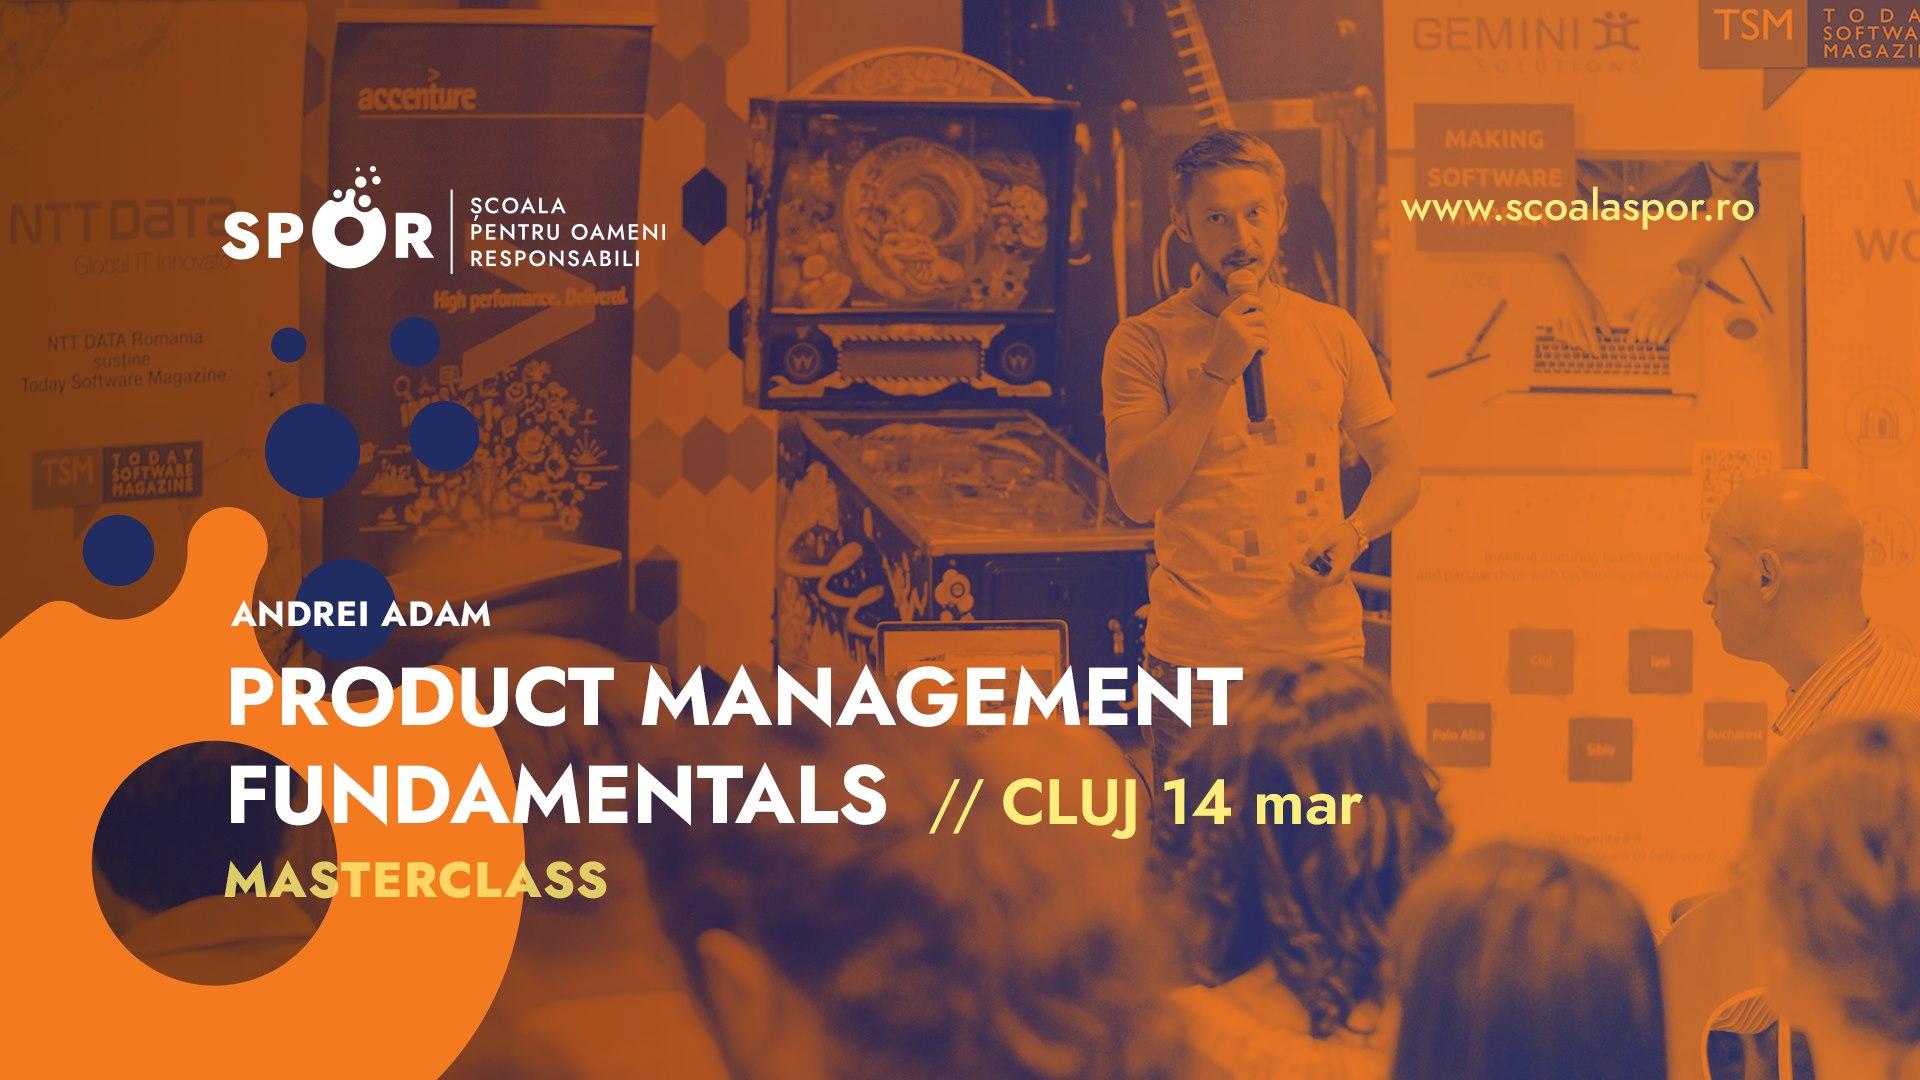 Product Management Fundamentals – Bazele Dezvoltării unui Produs